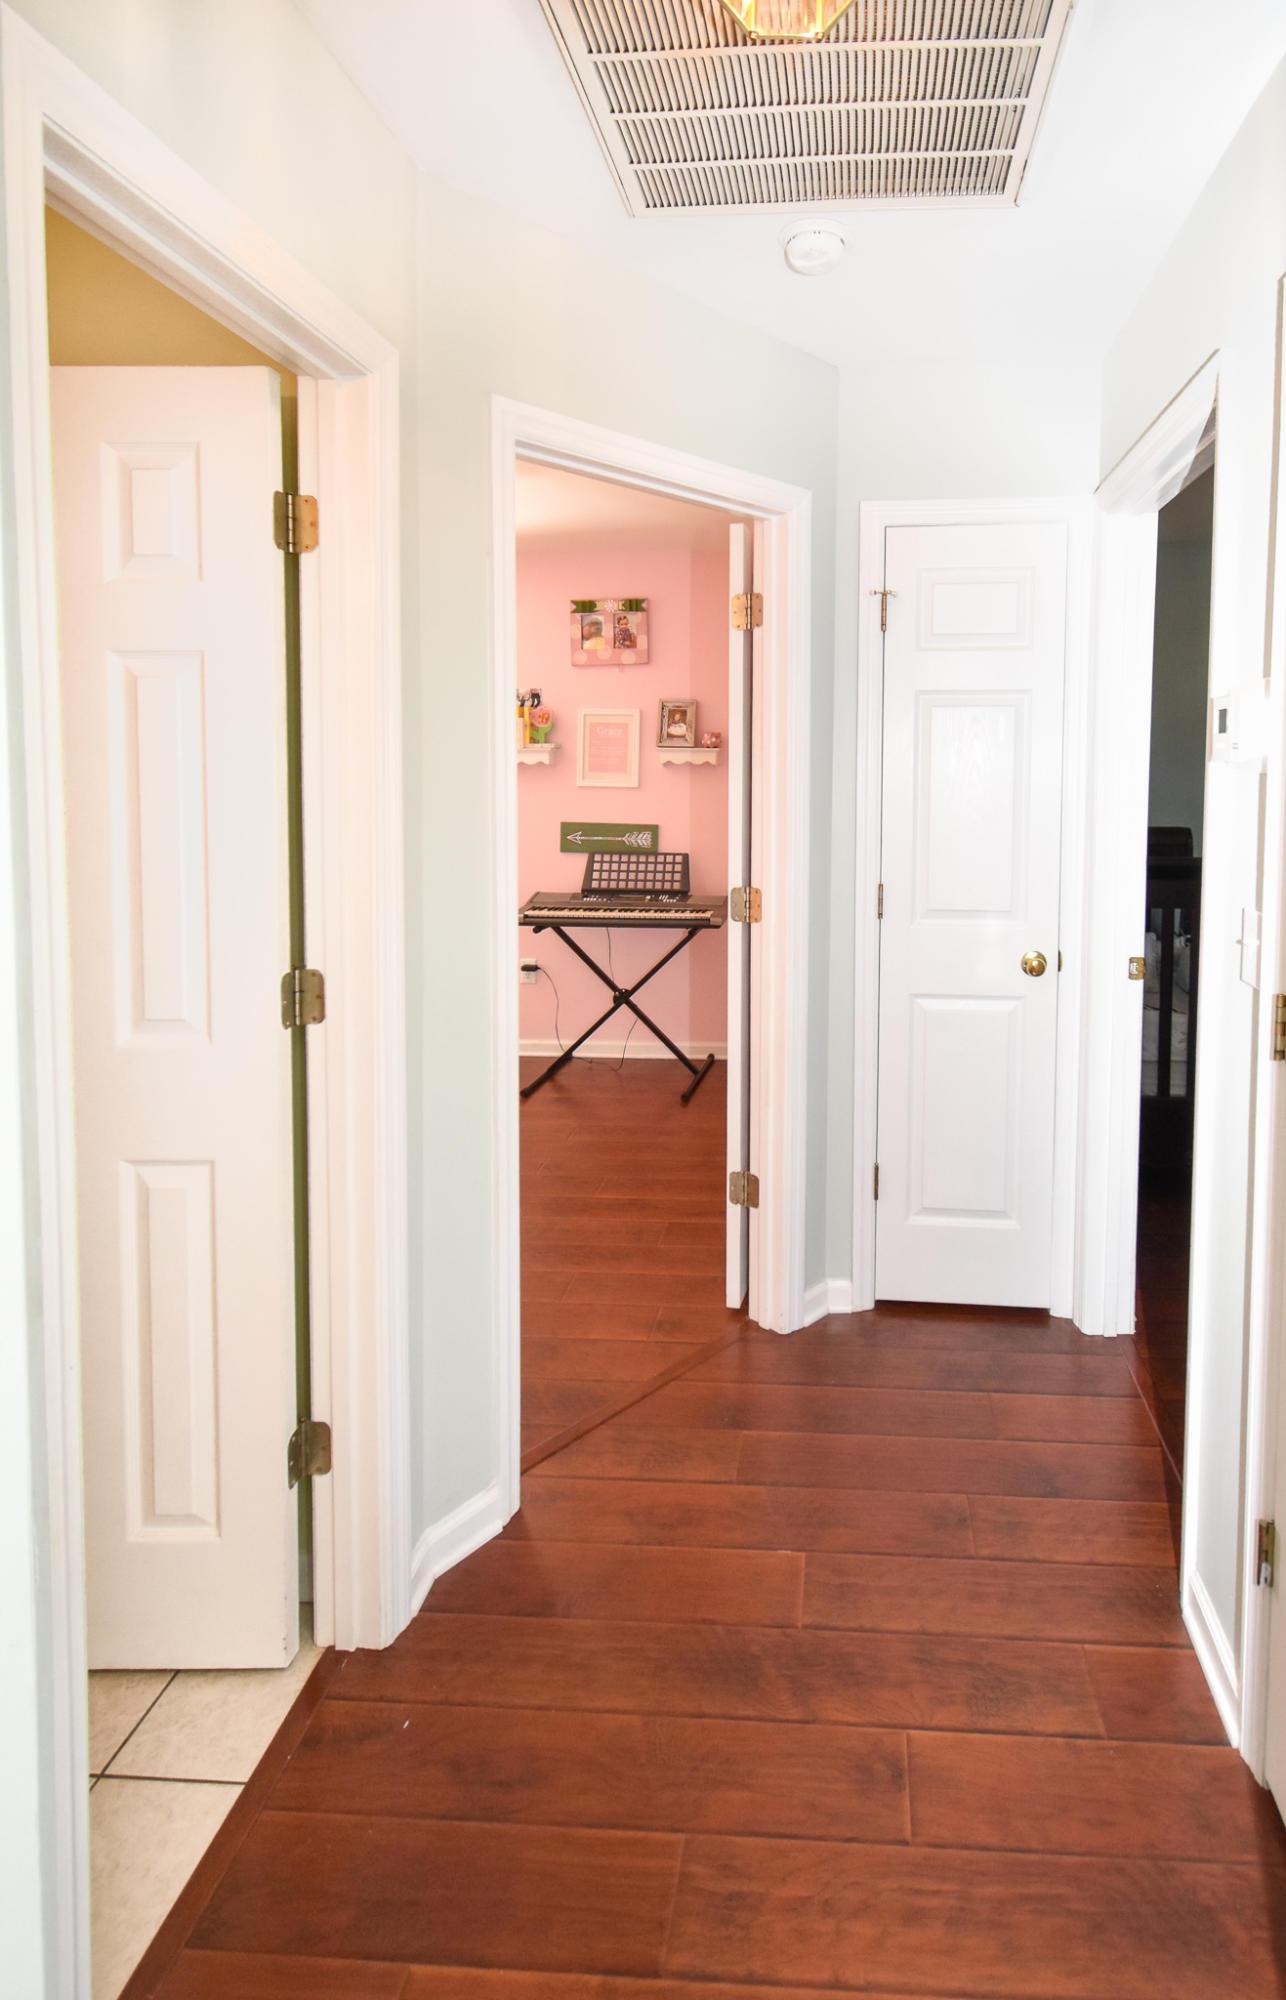 Park West Homes For Sale - 1444 Wellesley, Mount Pleasant, SC - 23